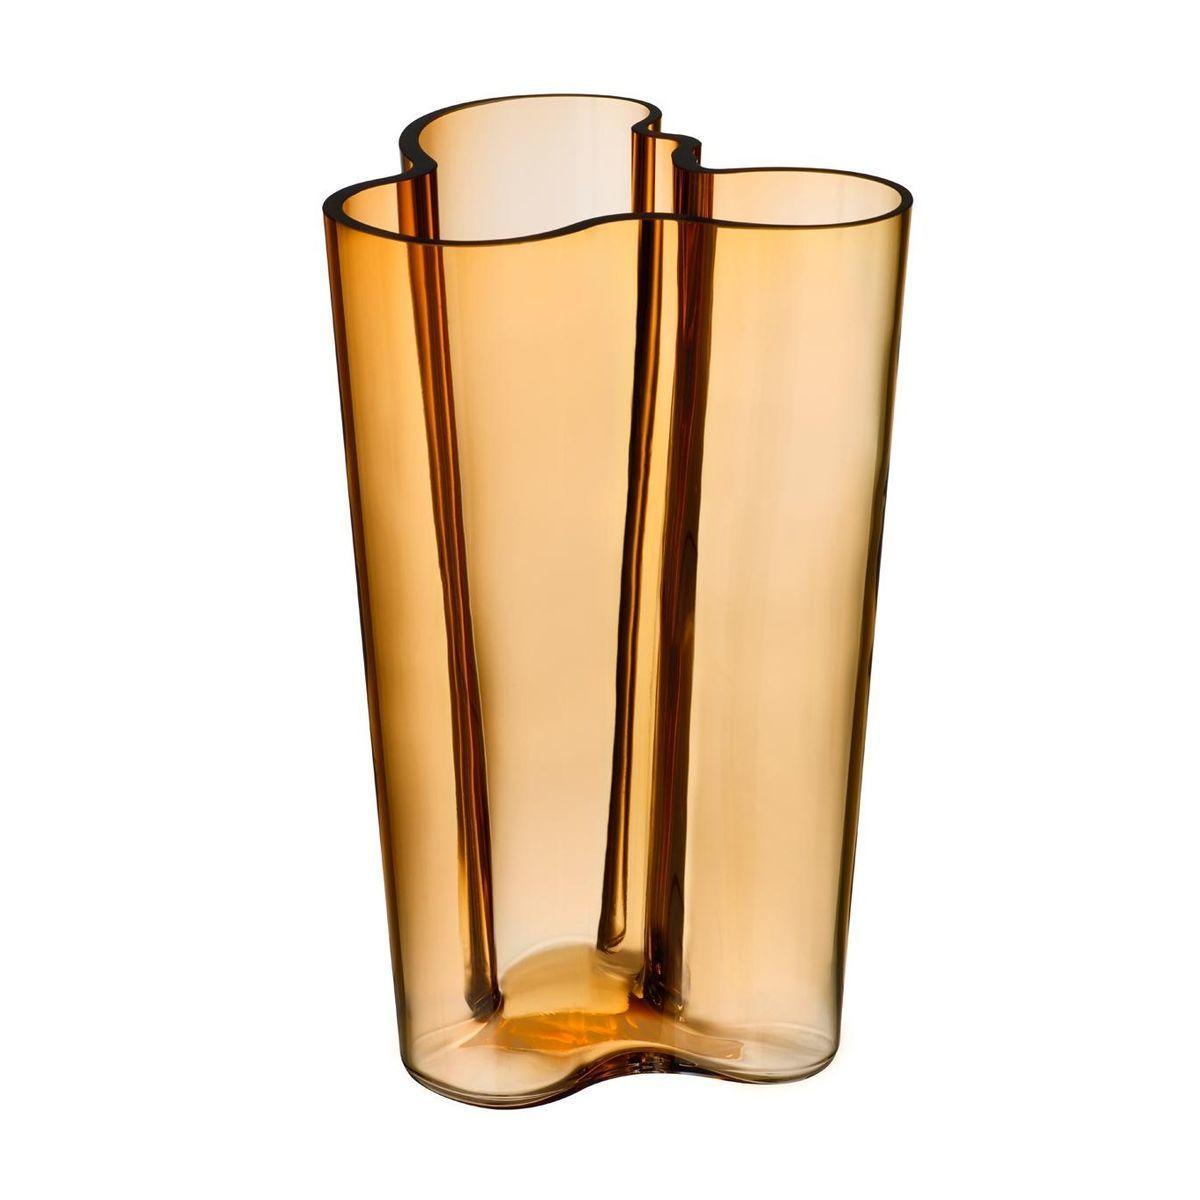 alvar aalto vase mm  iittala  ambientedirectcom - iittala  alvar aalto vase mm  bronze desert